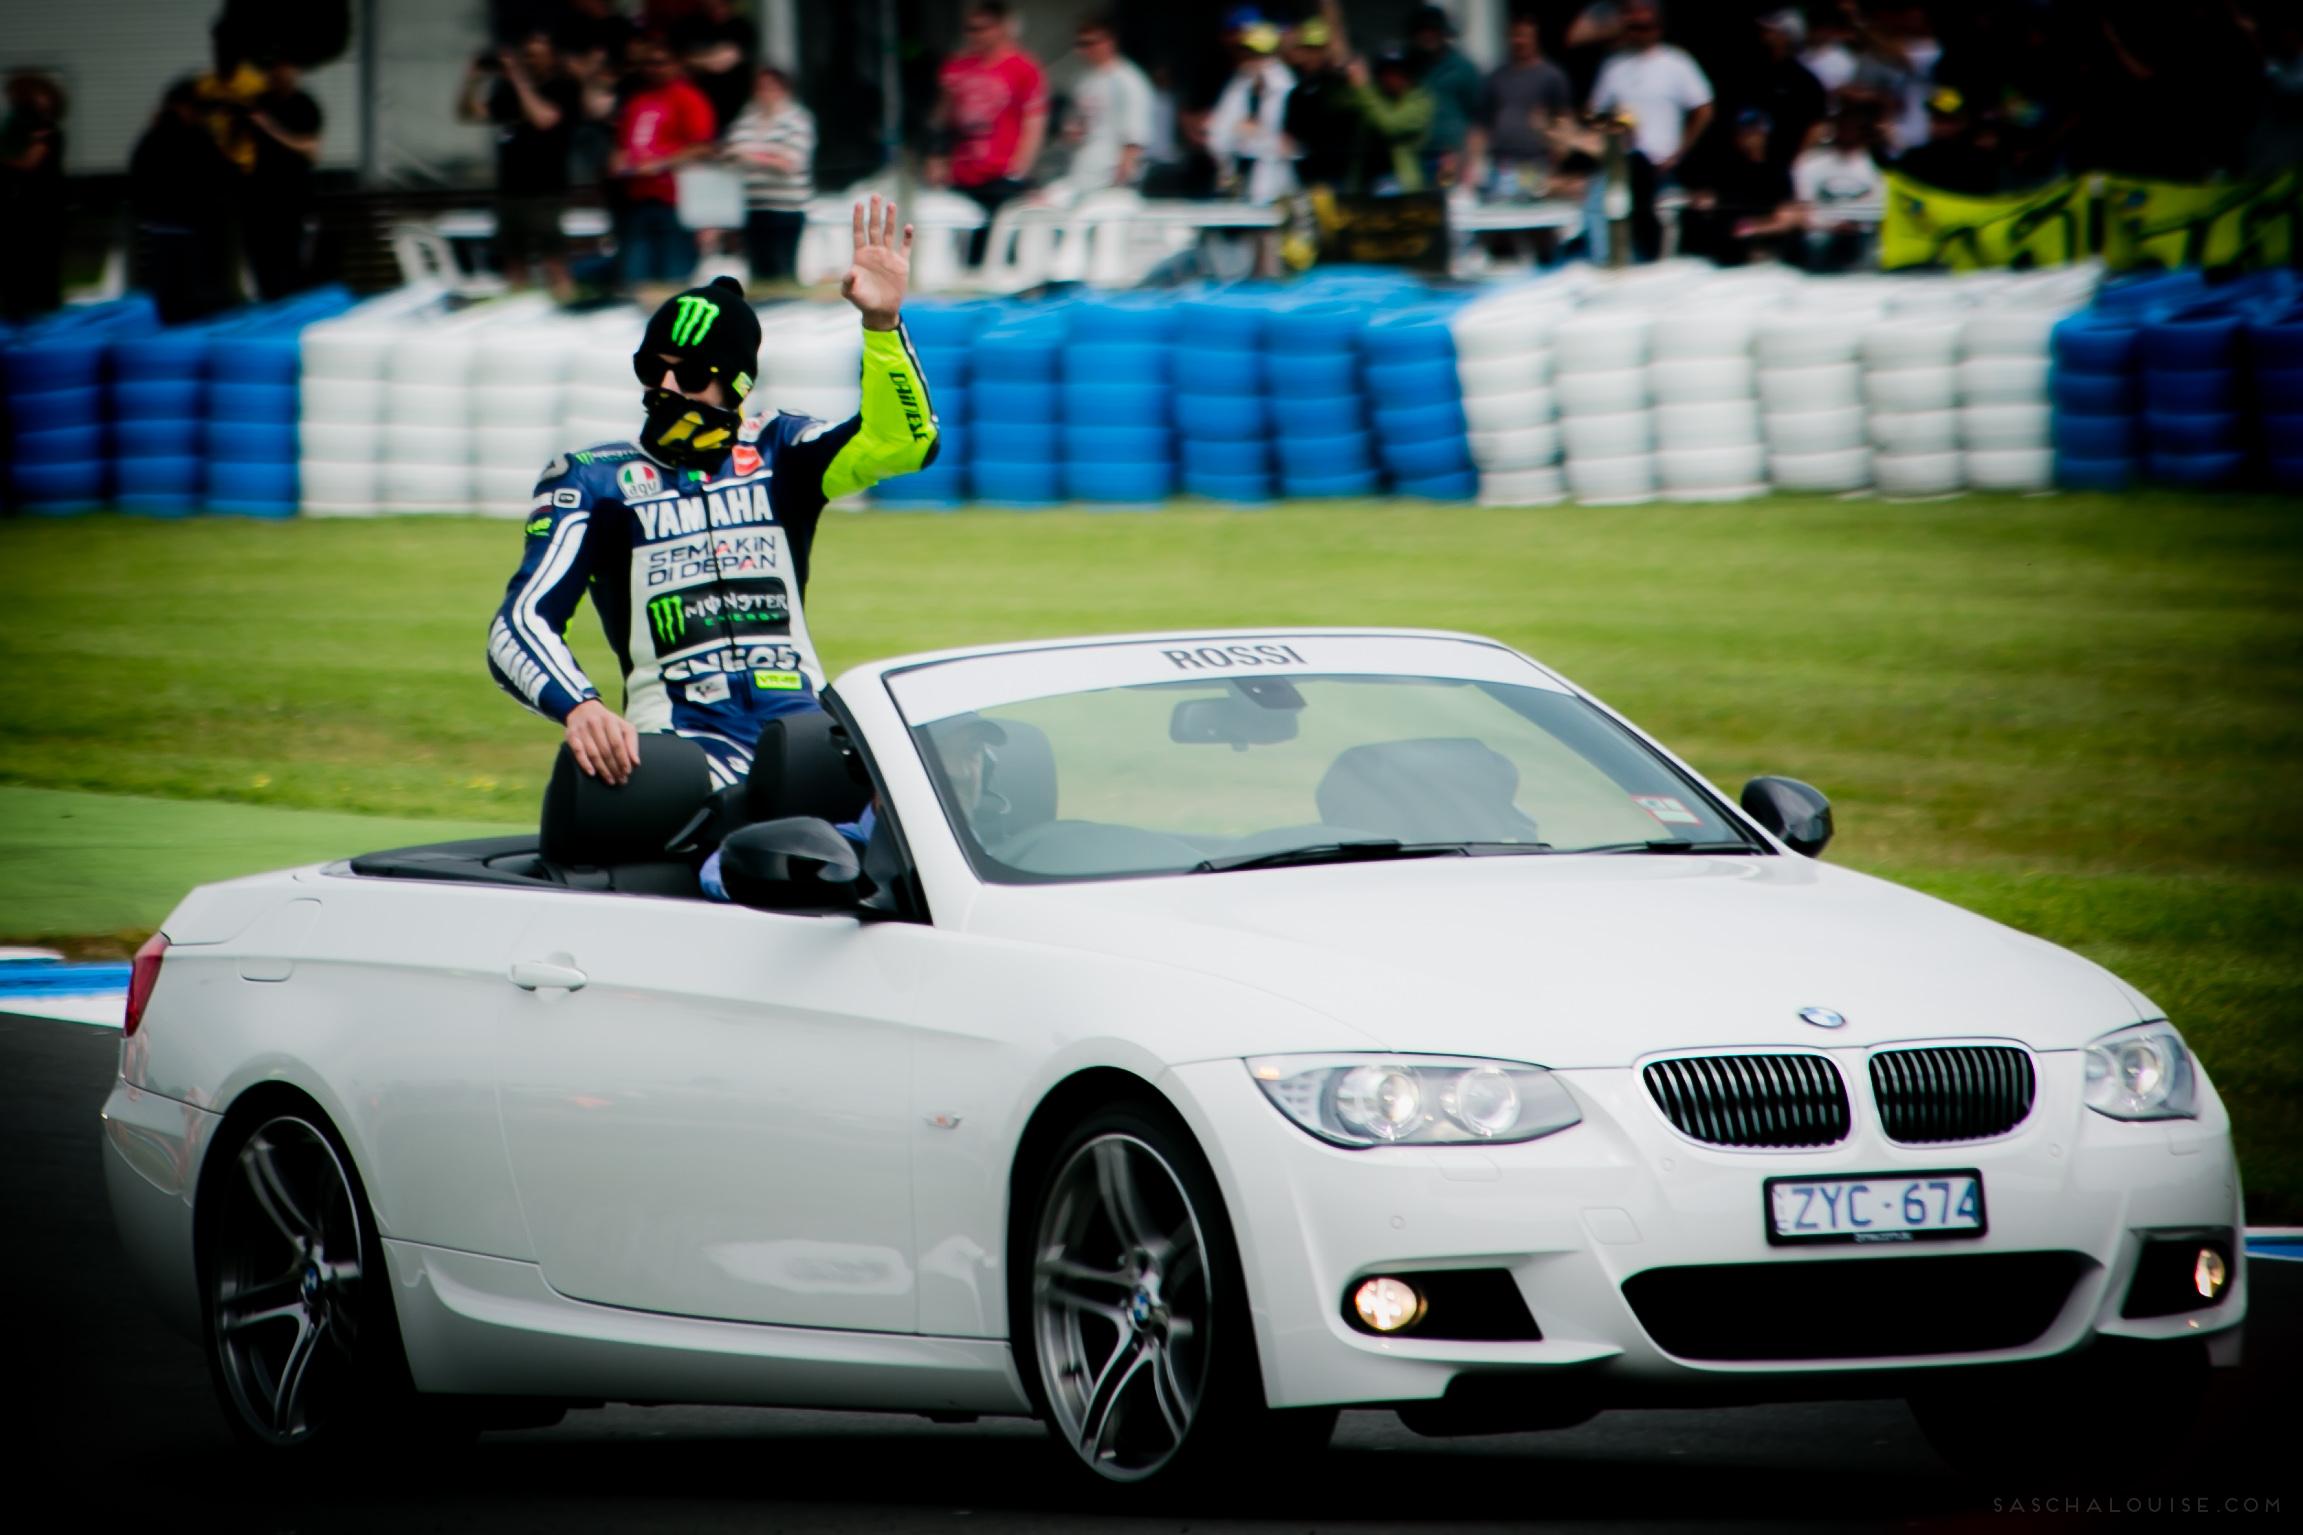 saschalouise.com_MotoGP2013-3.jpg